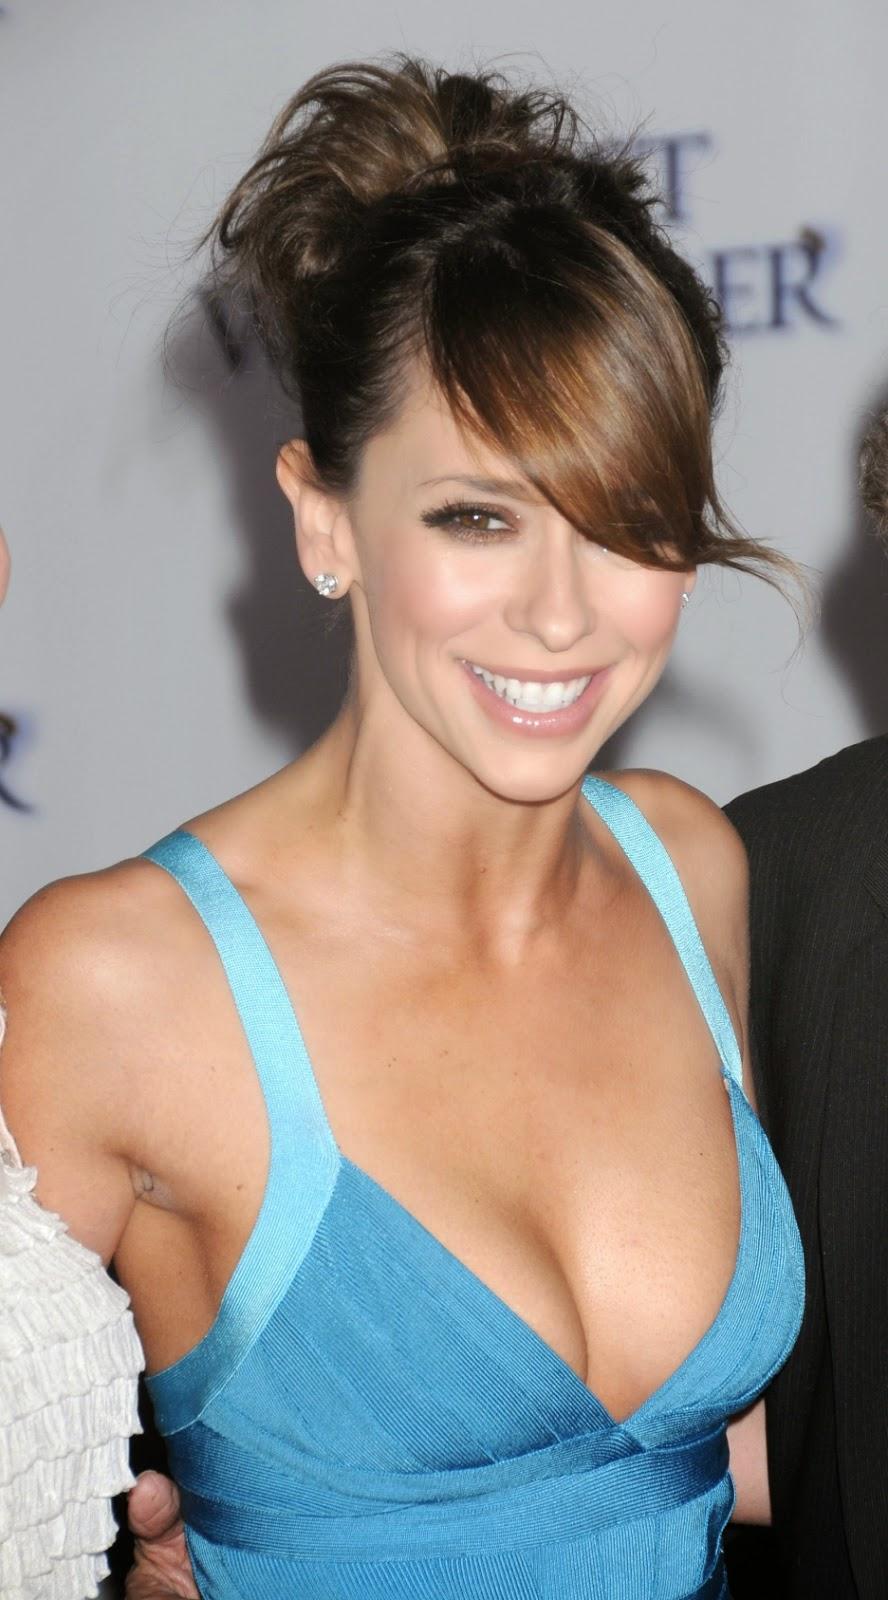 Jennifer Love Hewitt born February 21, 1979 (age 39)